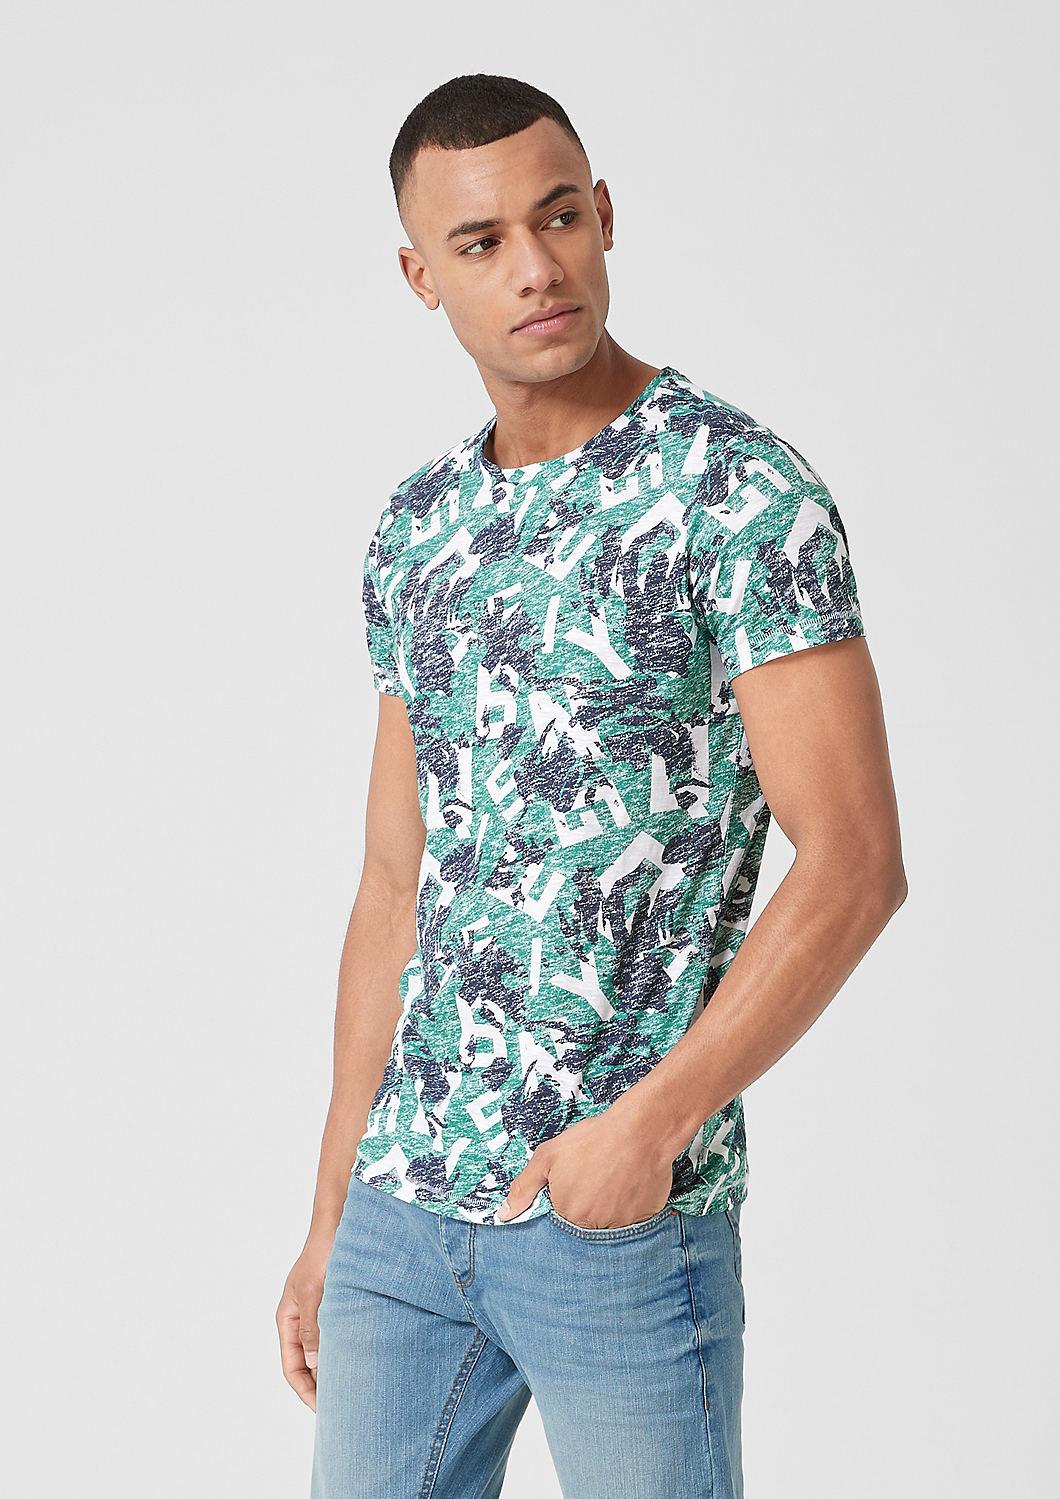 s.Oliver - T-Shirt mit Allover-Print - 4